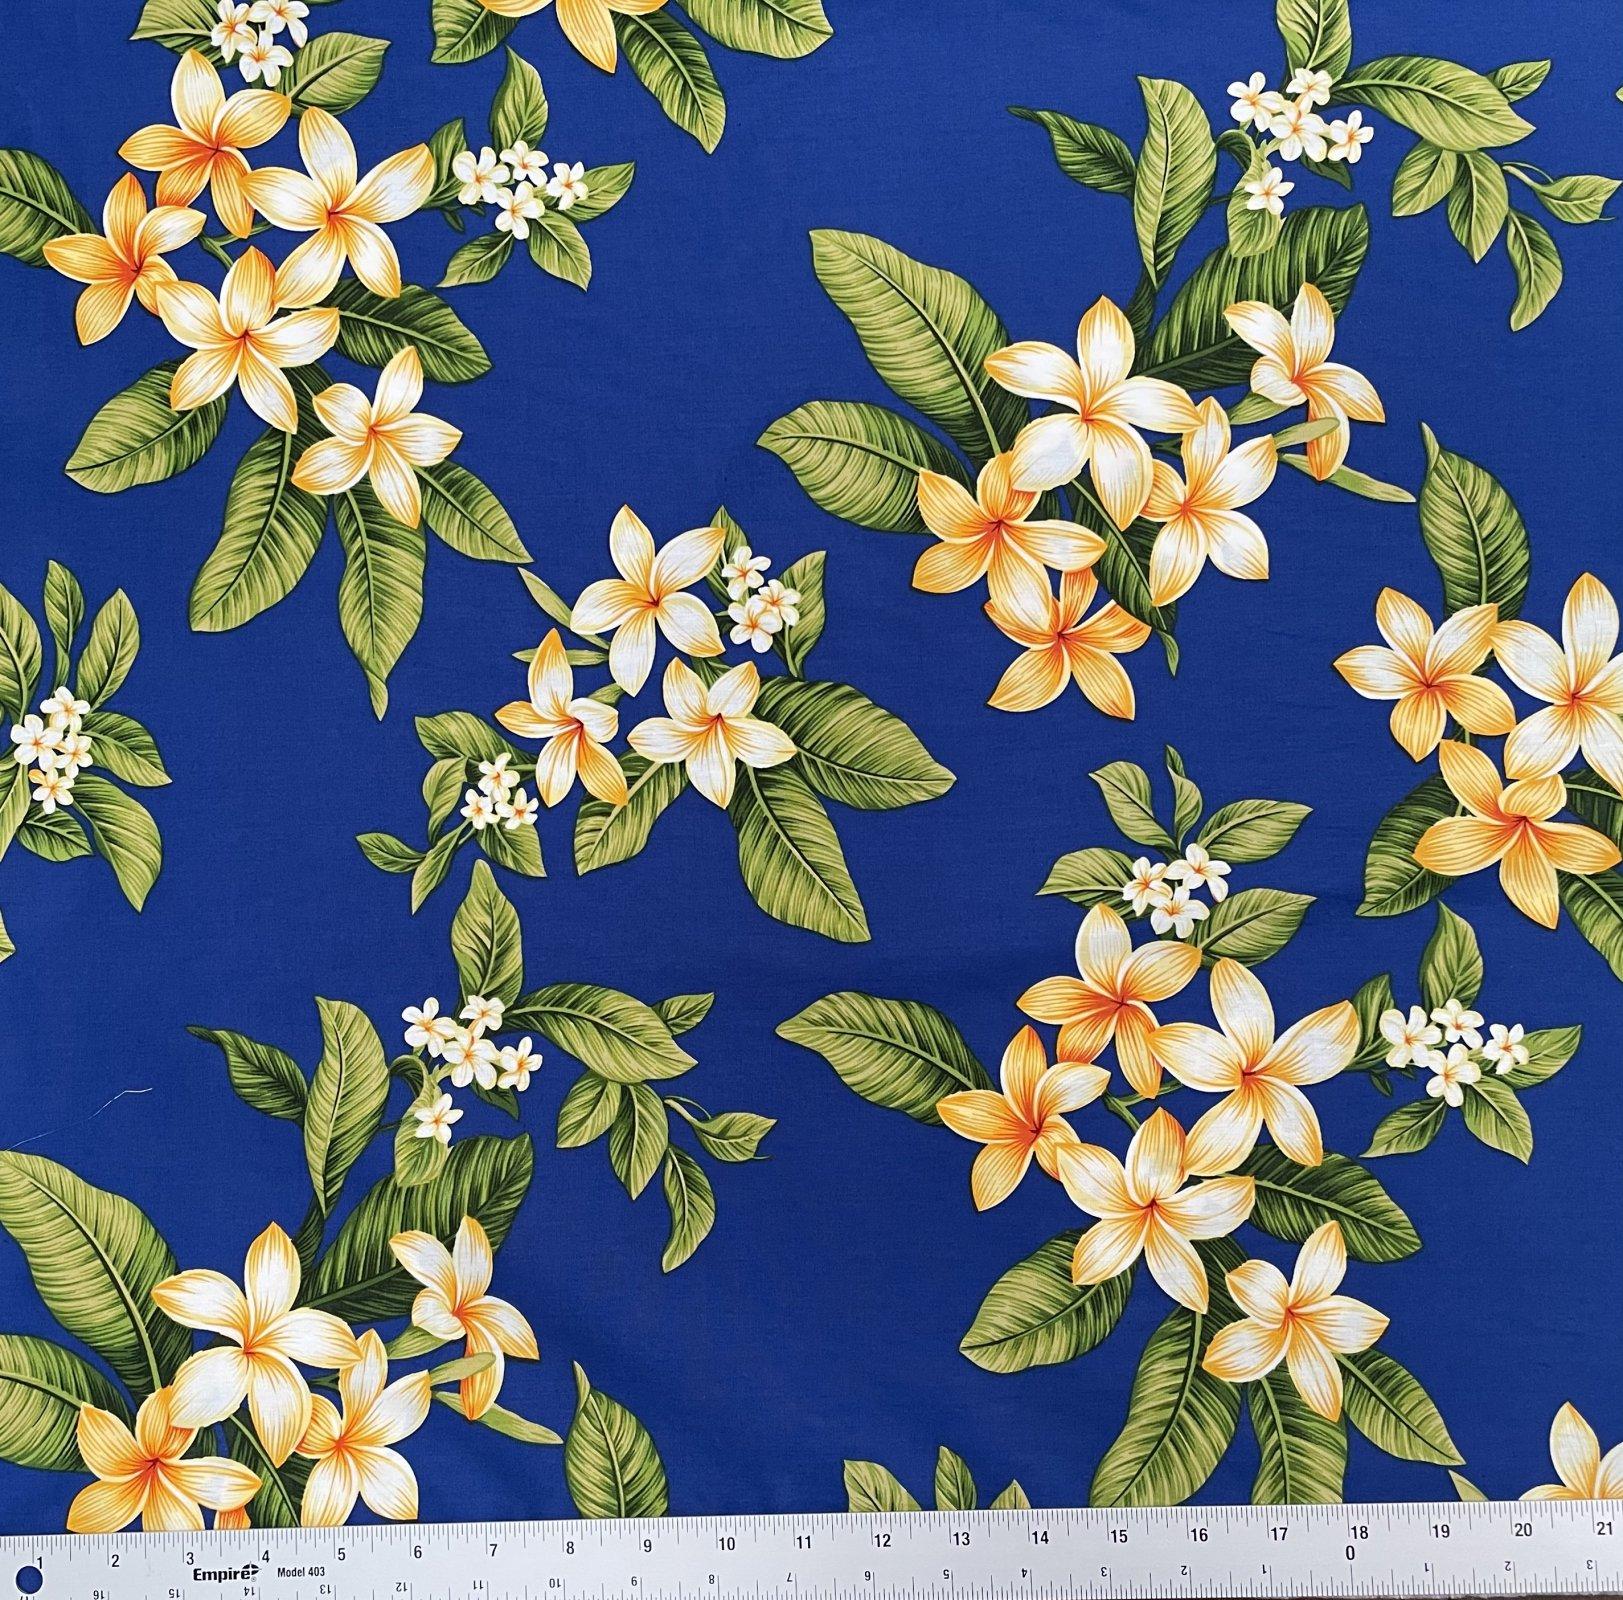 Plumerias on Royal Blue